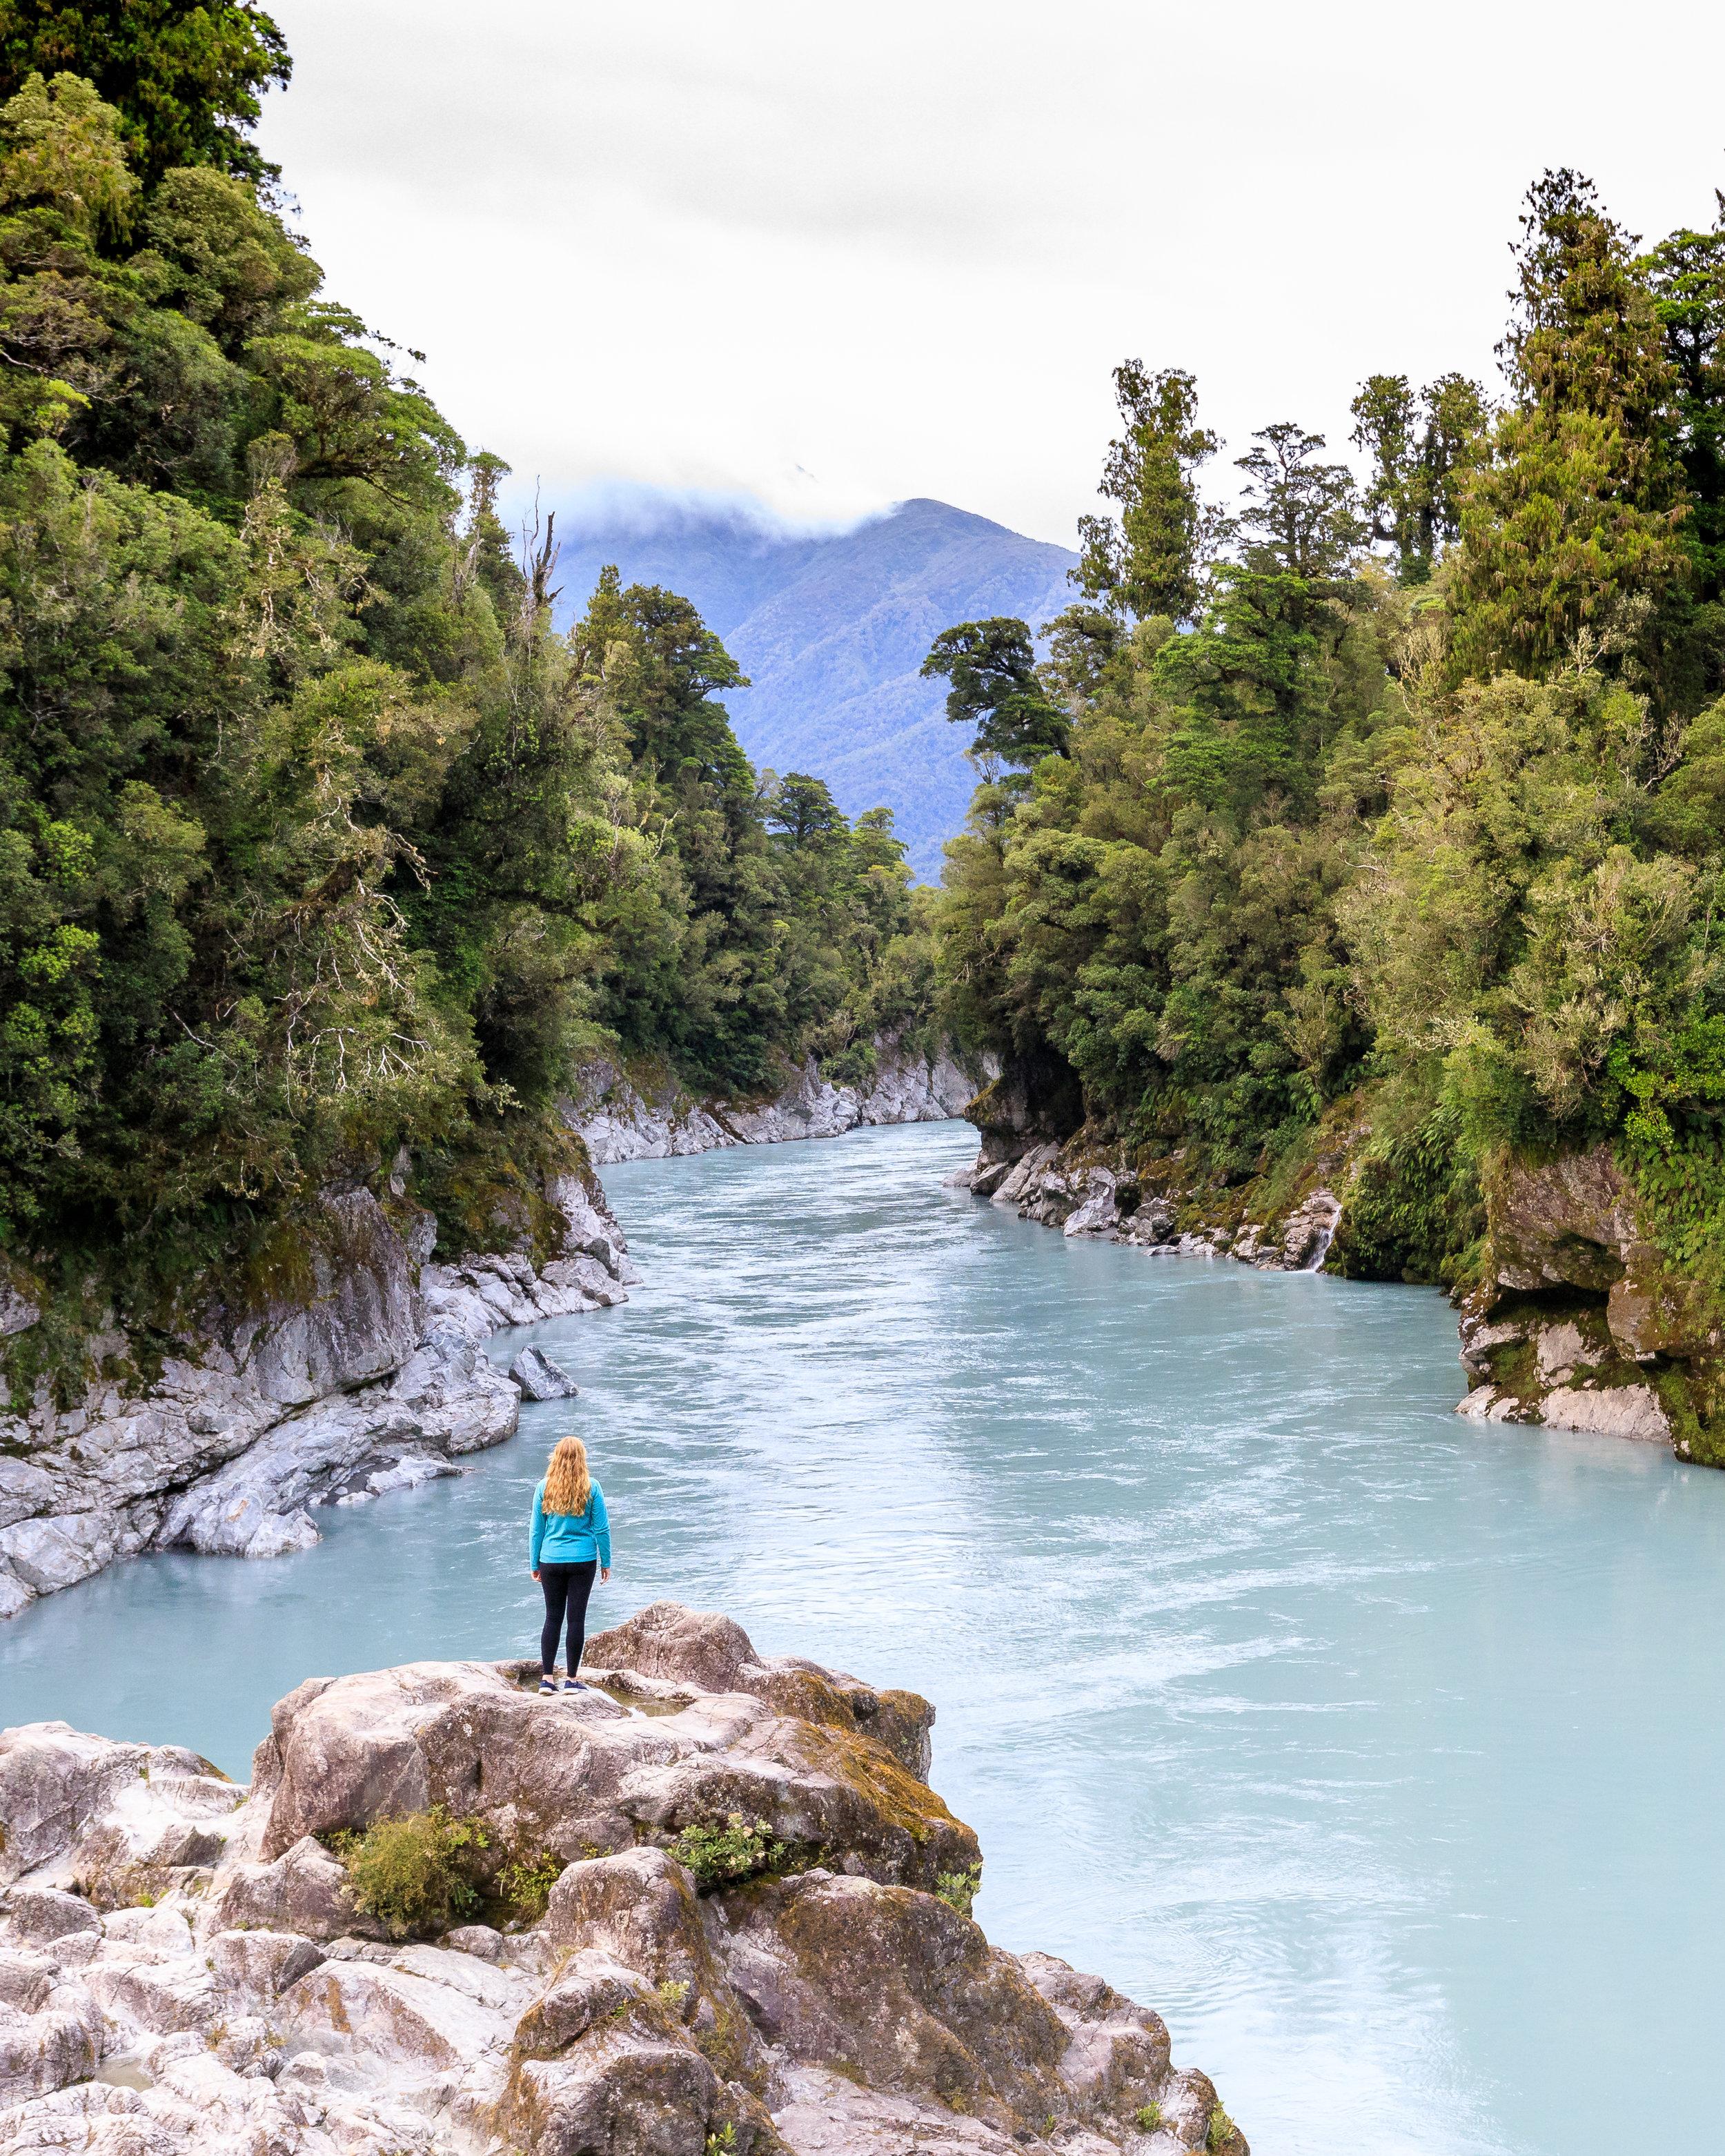 Hokitika Gorge on the West Coast of the South Island of New Zealand